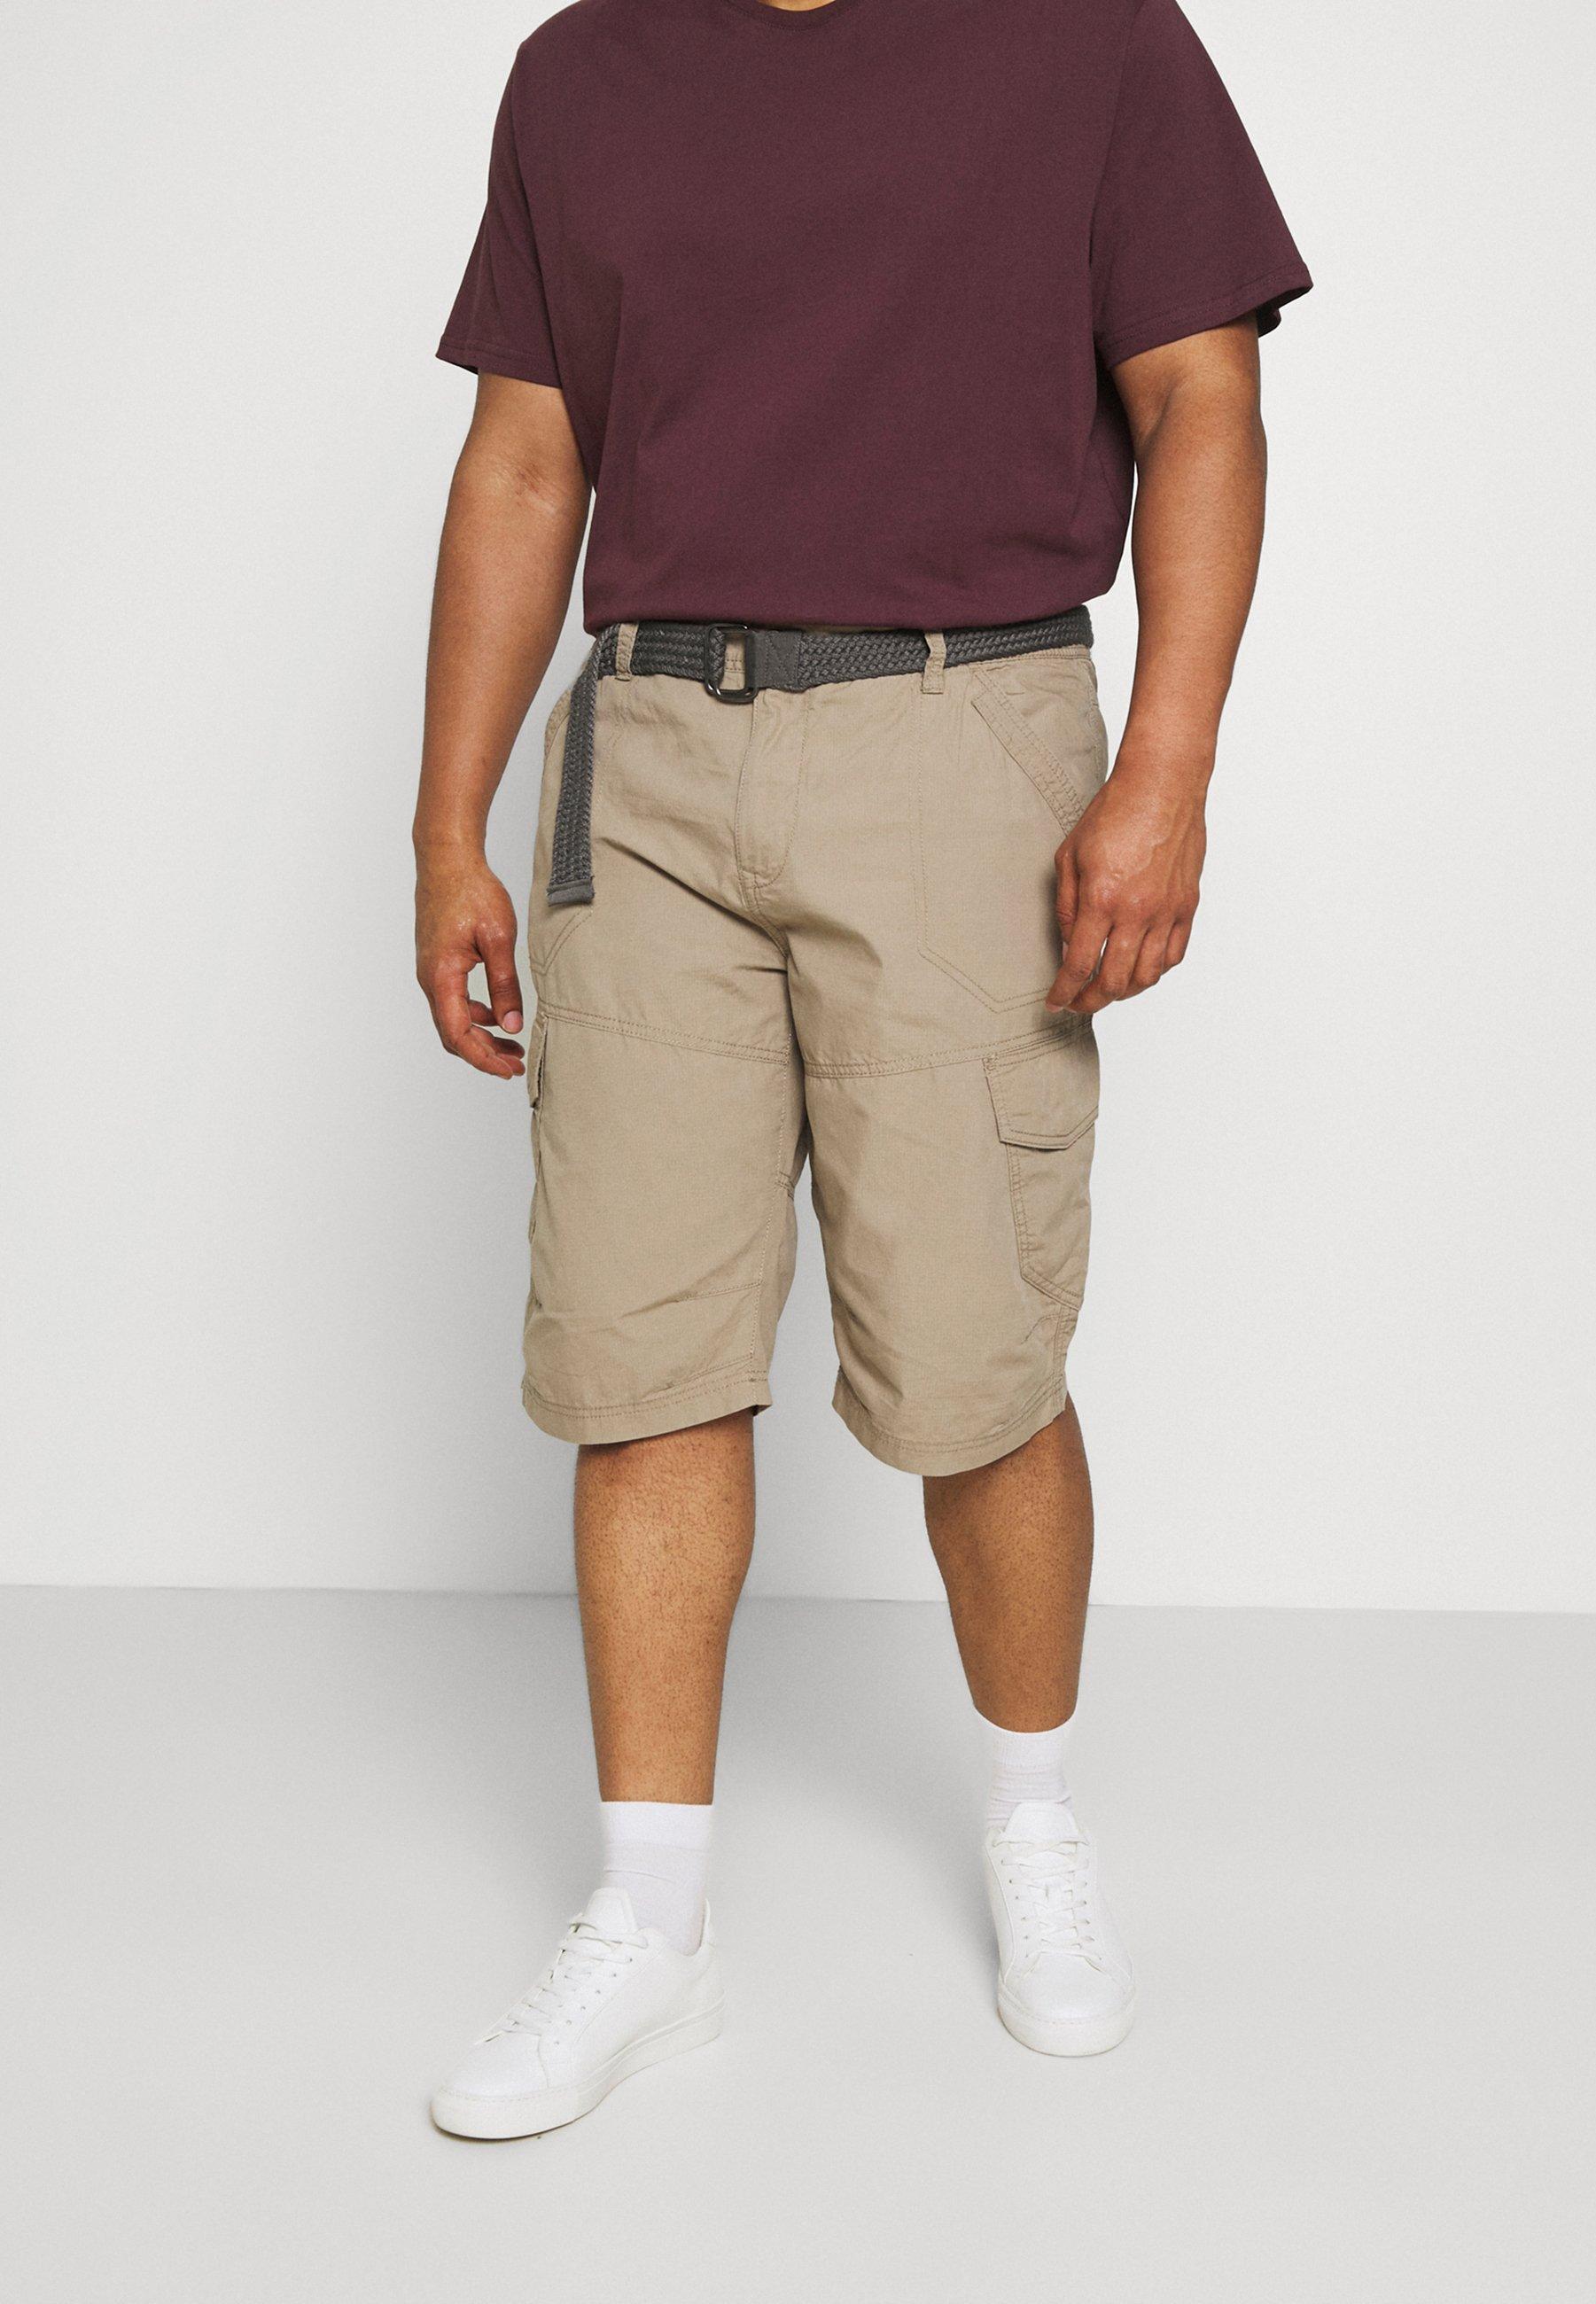 Homme CARGO WITH BELT - Short